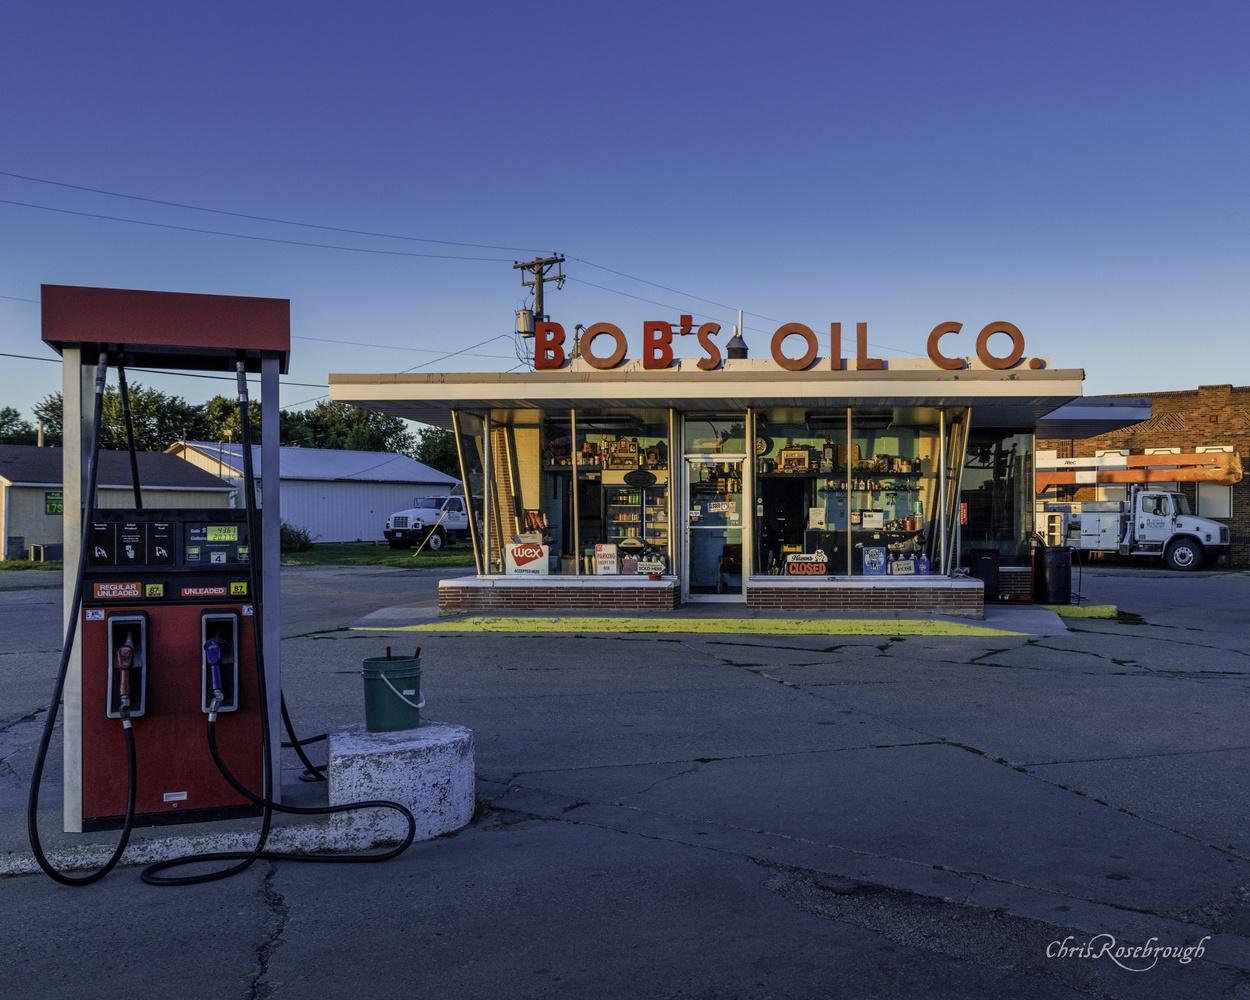 North Dakota Street Photography 2 by Chris Rosebrough